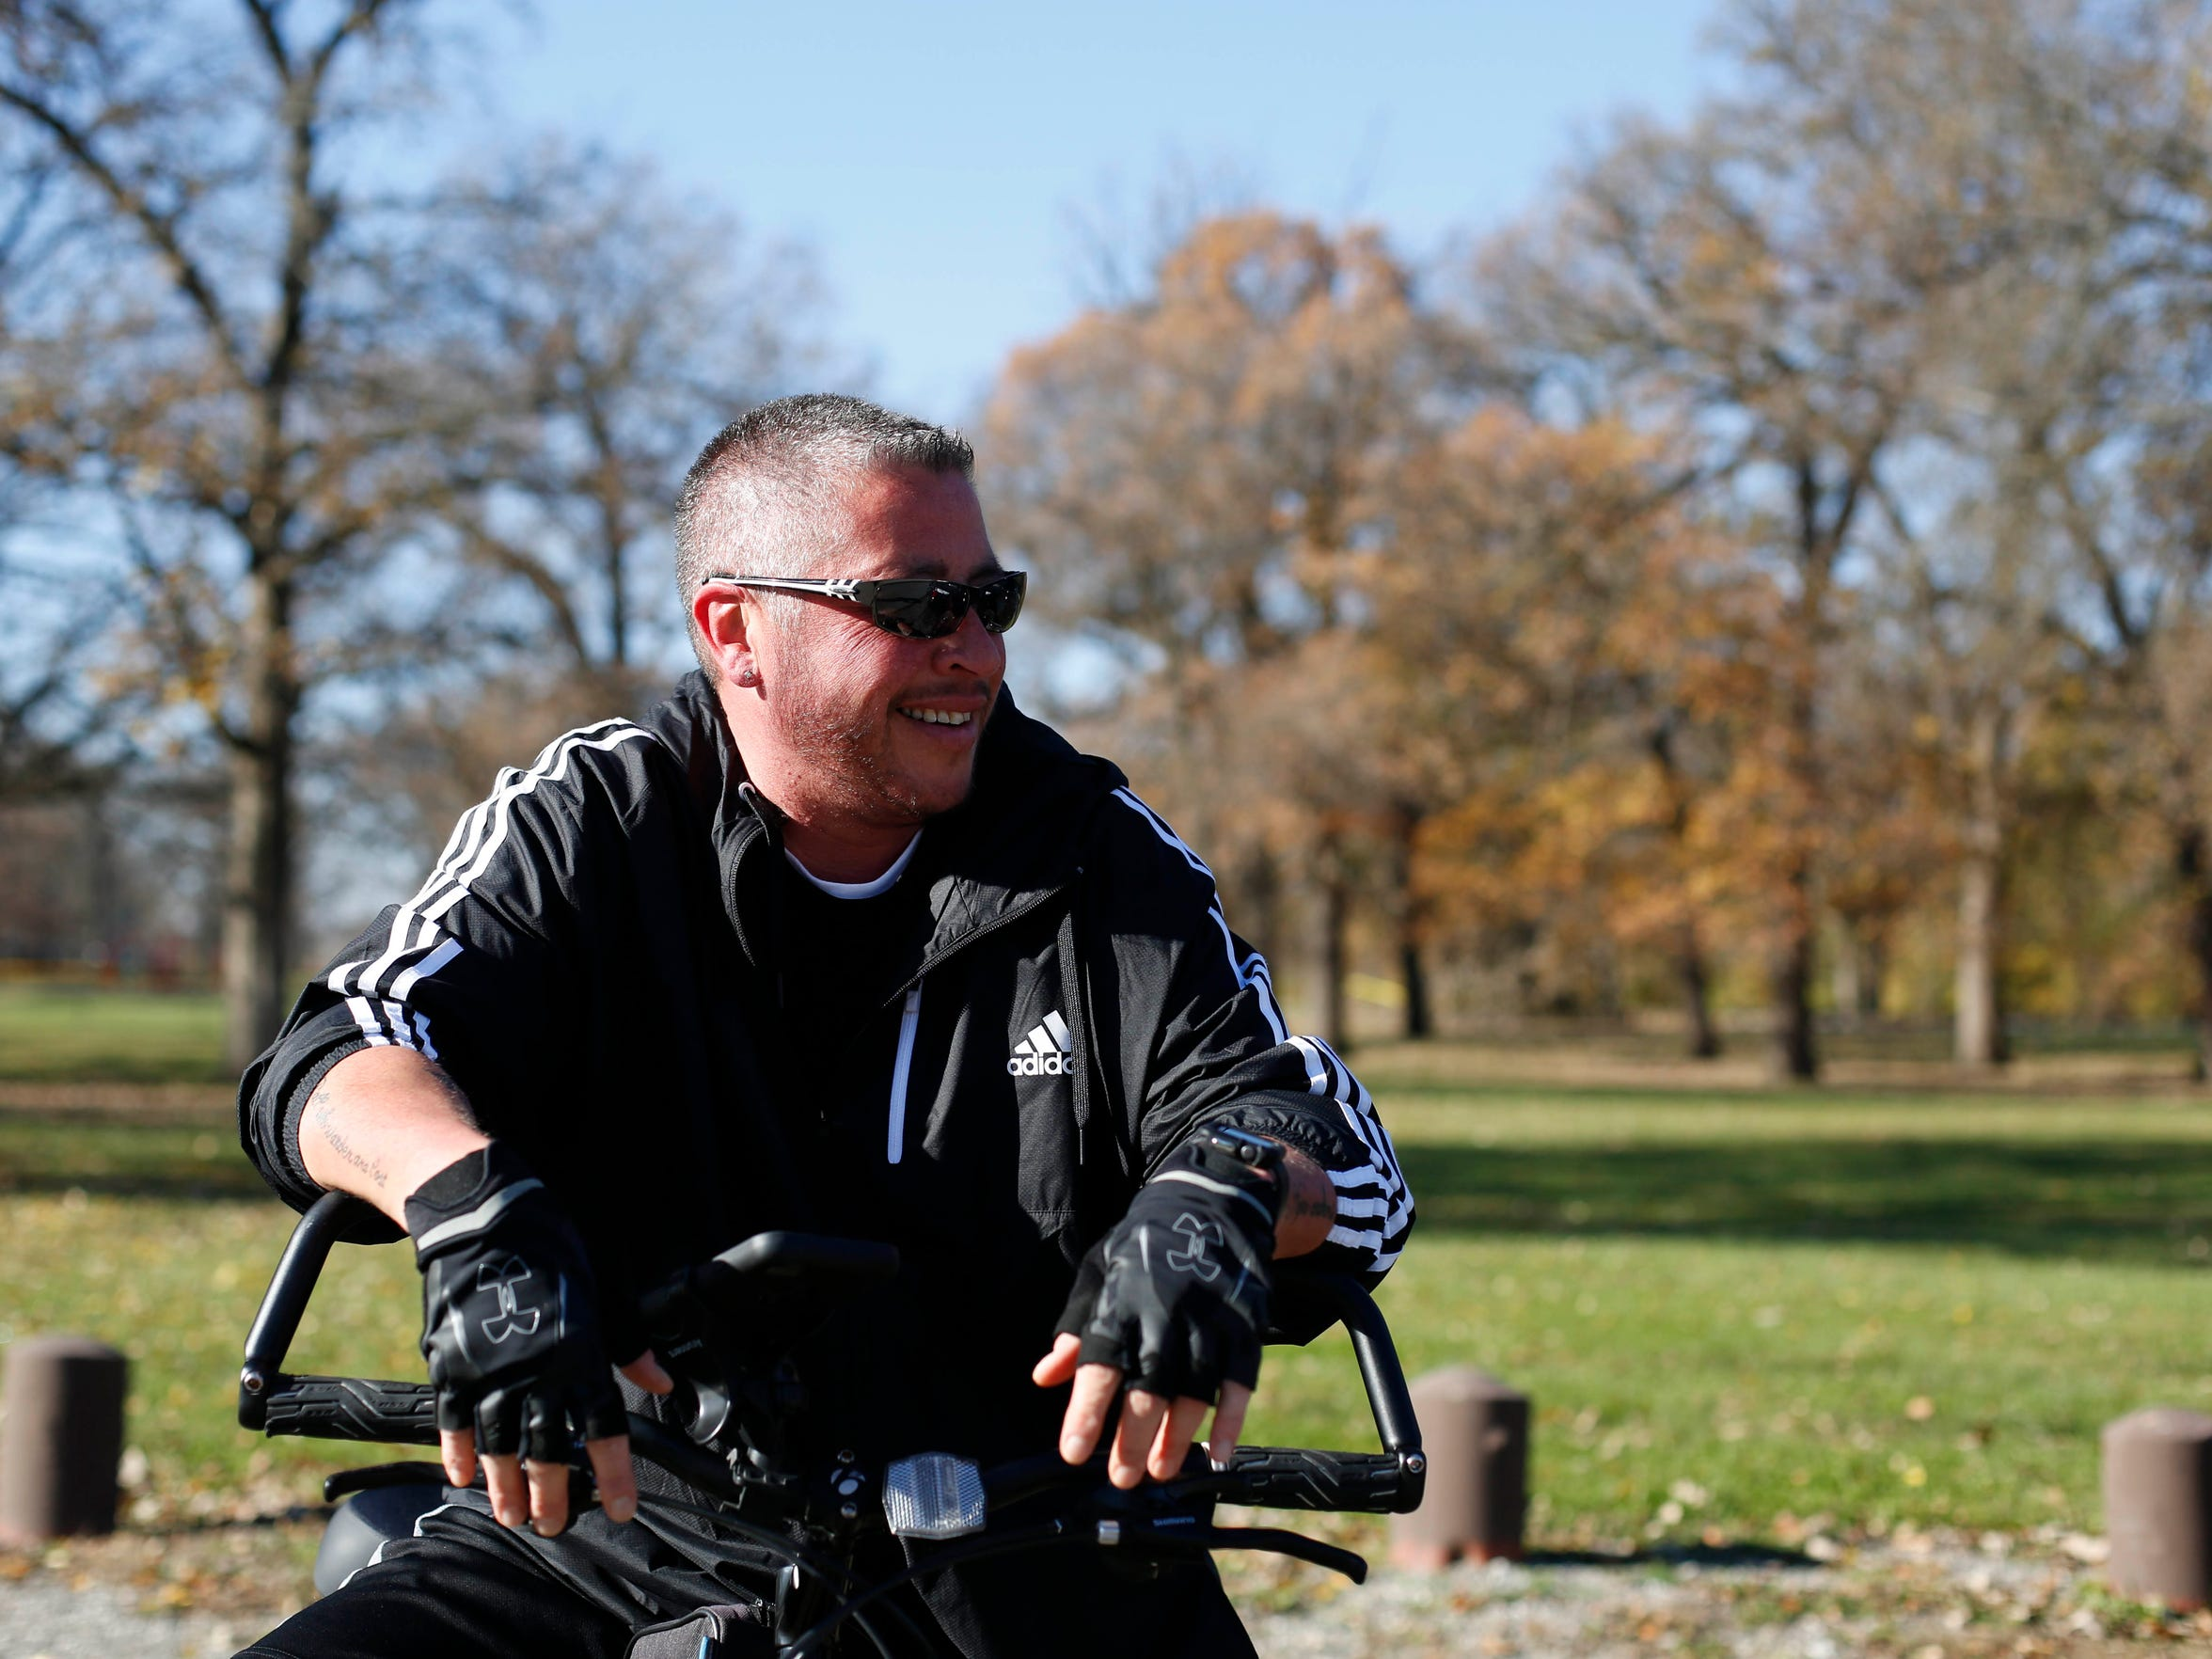 Aiden DeLathower gets ready to ride Sunday, Nov. 6,